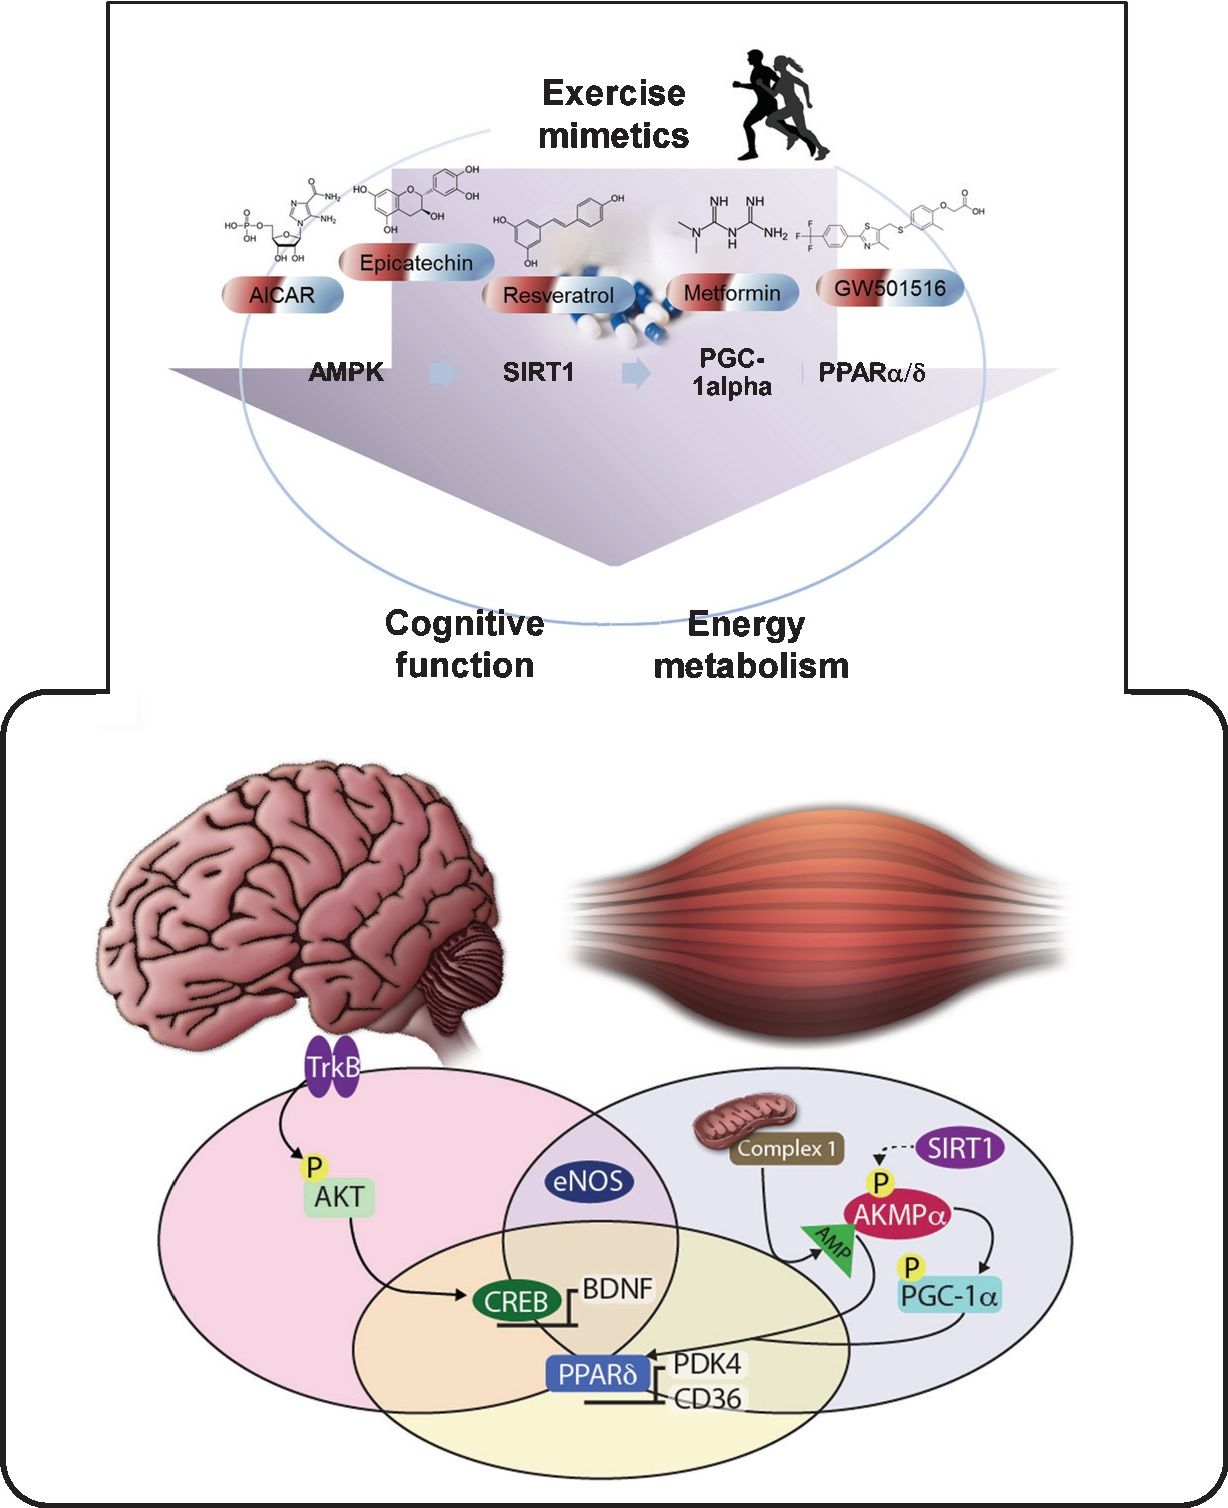 https://content.iospress.com/articles/brain-plasticity/bpl160043